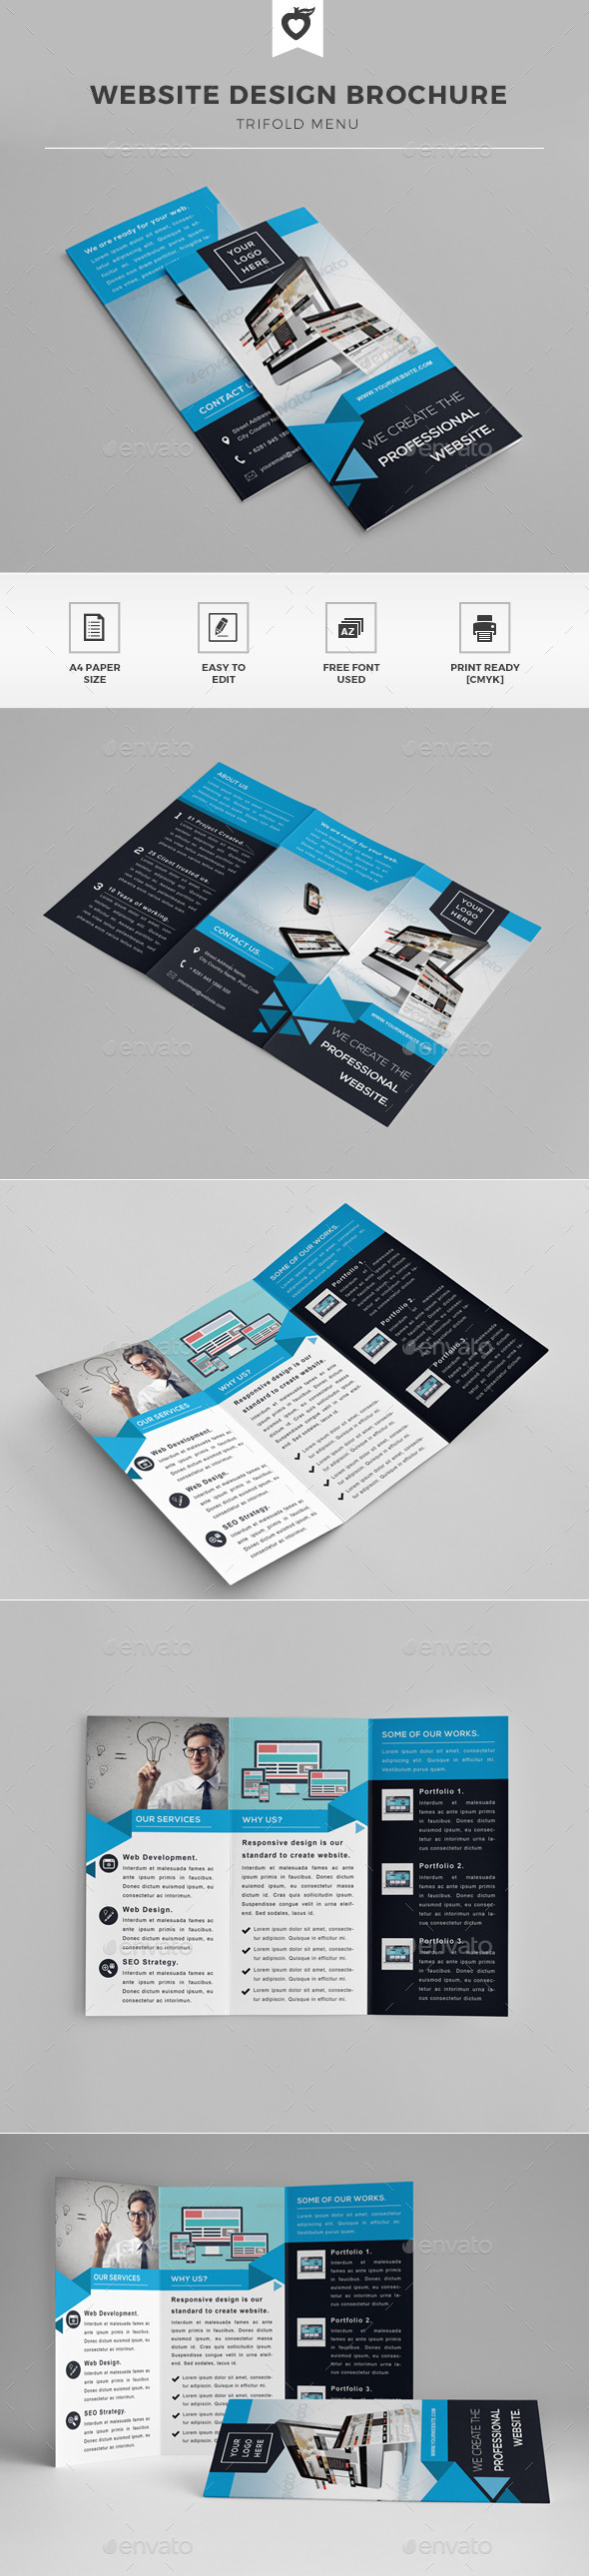 Website Design Trifold Brochure - Informational Brochures